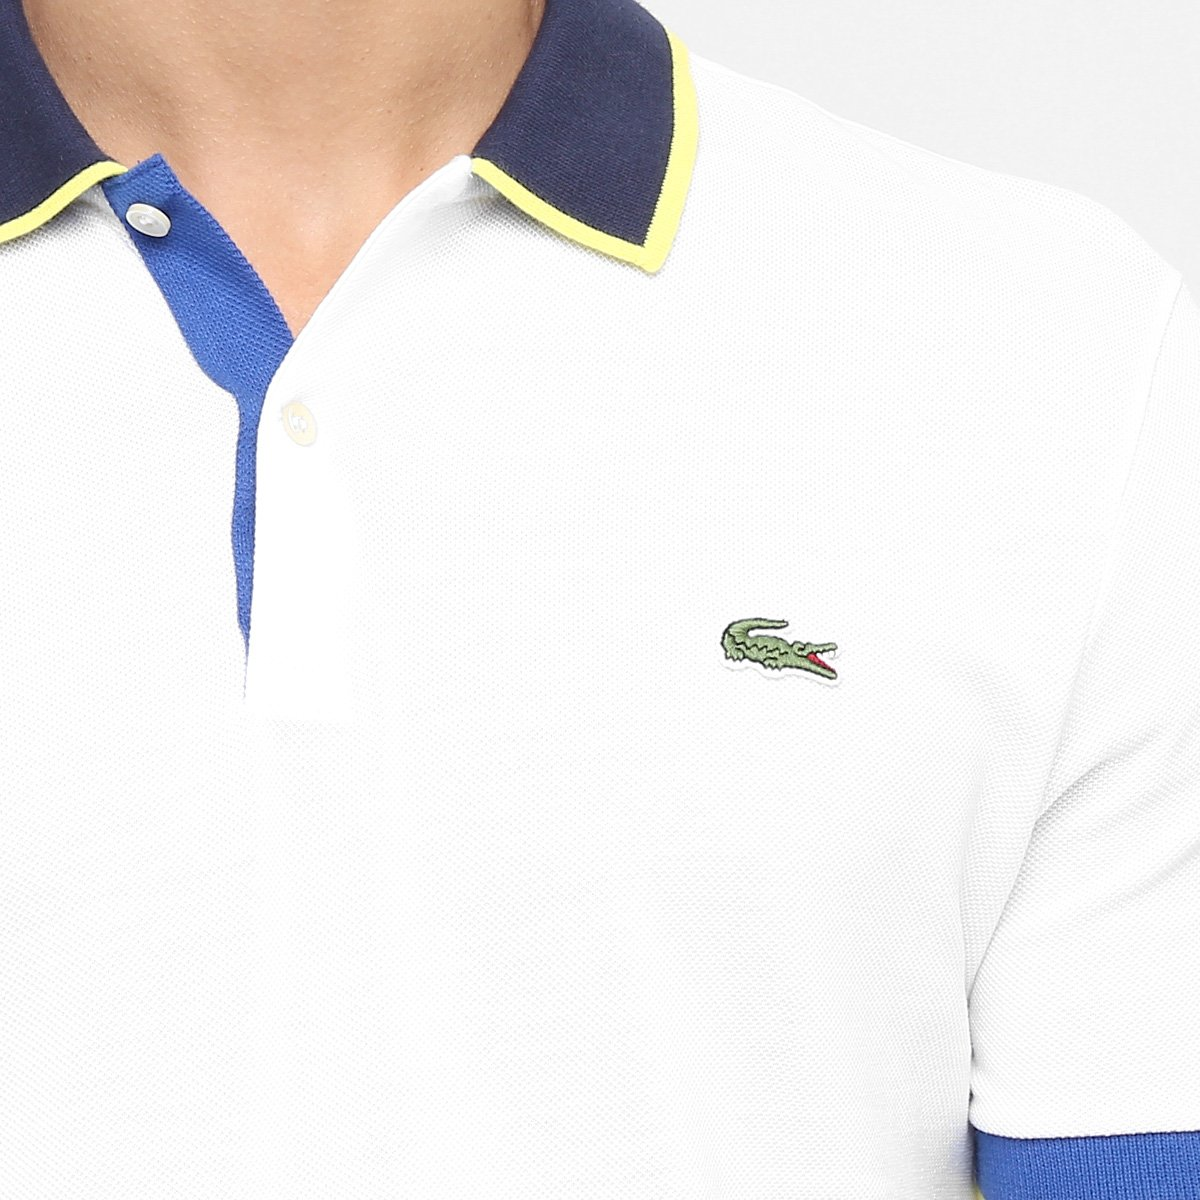 Camisa Polo Lacoste Live Piquet Fancy - Compre Agora   Zattini e5b6329da0